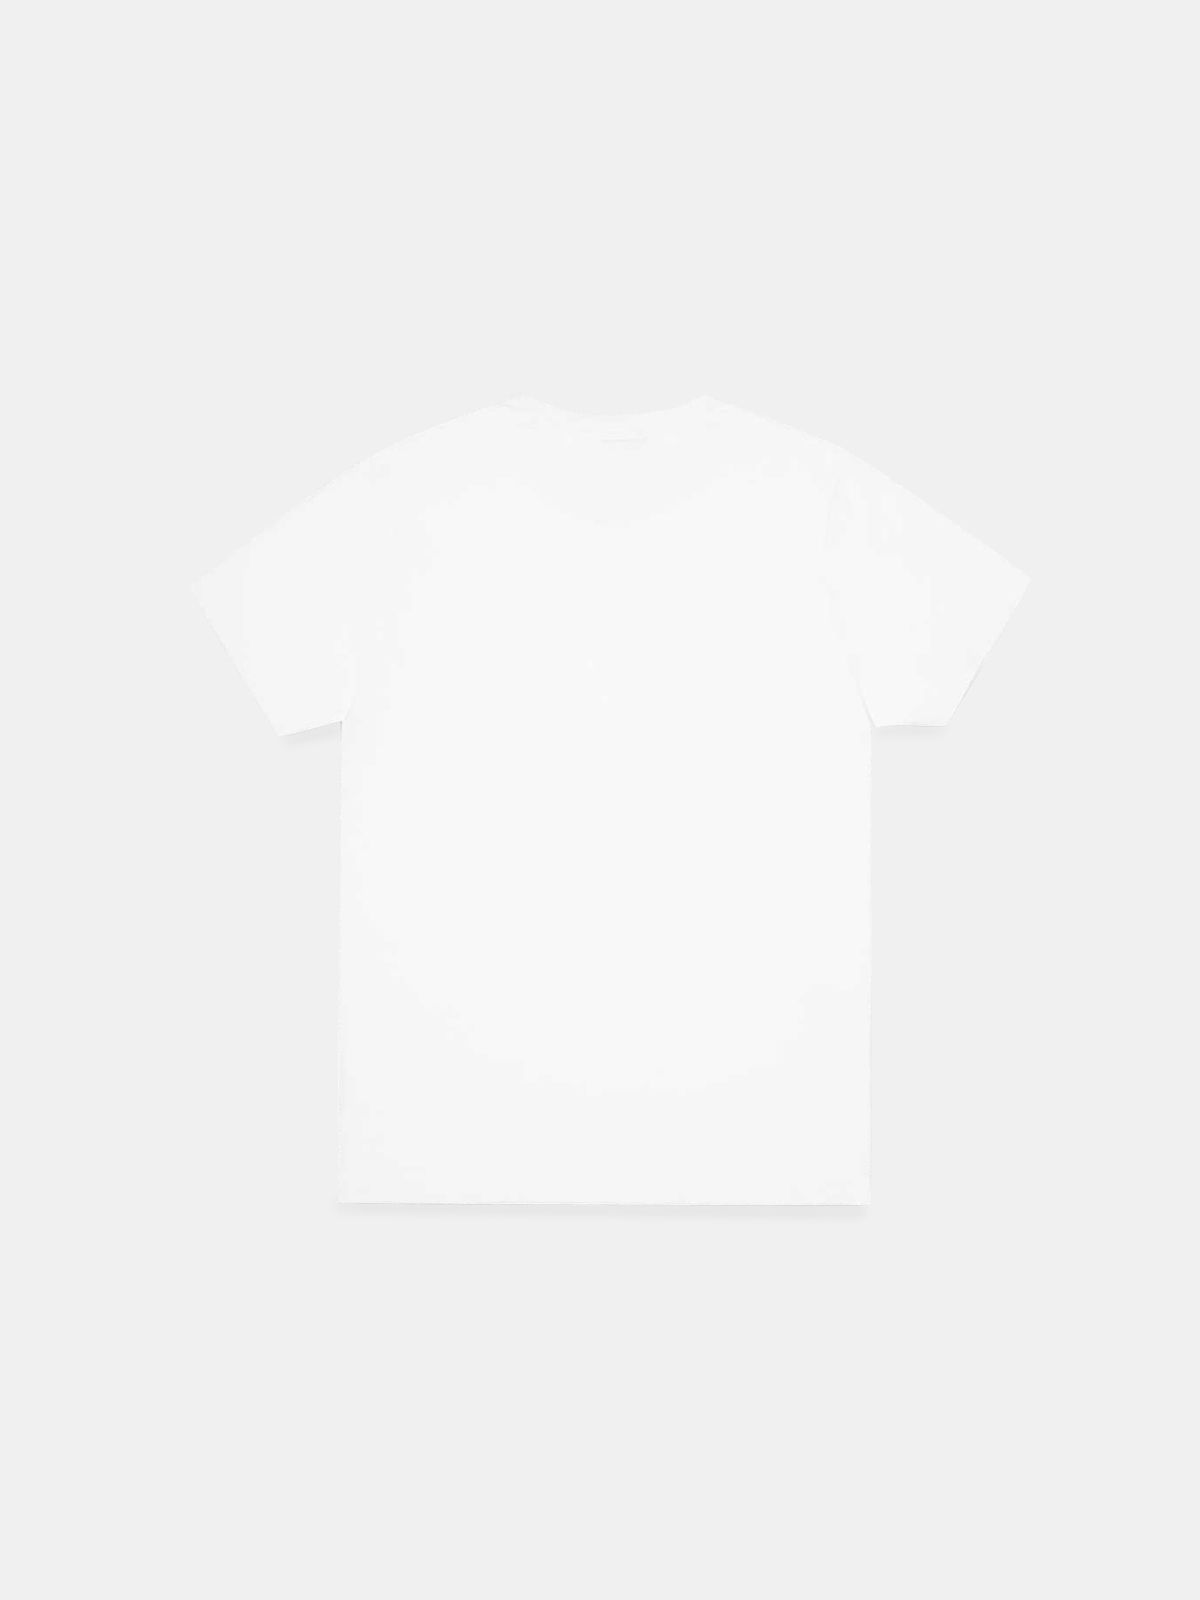 Golden Goose - #TogetherWeAreStronger T-shirt in